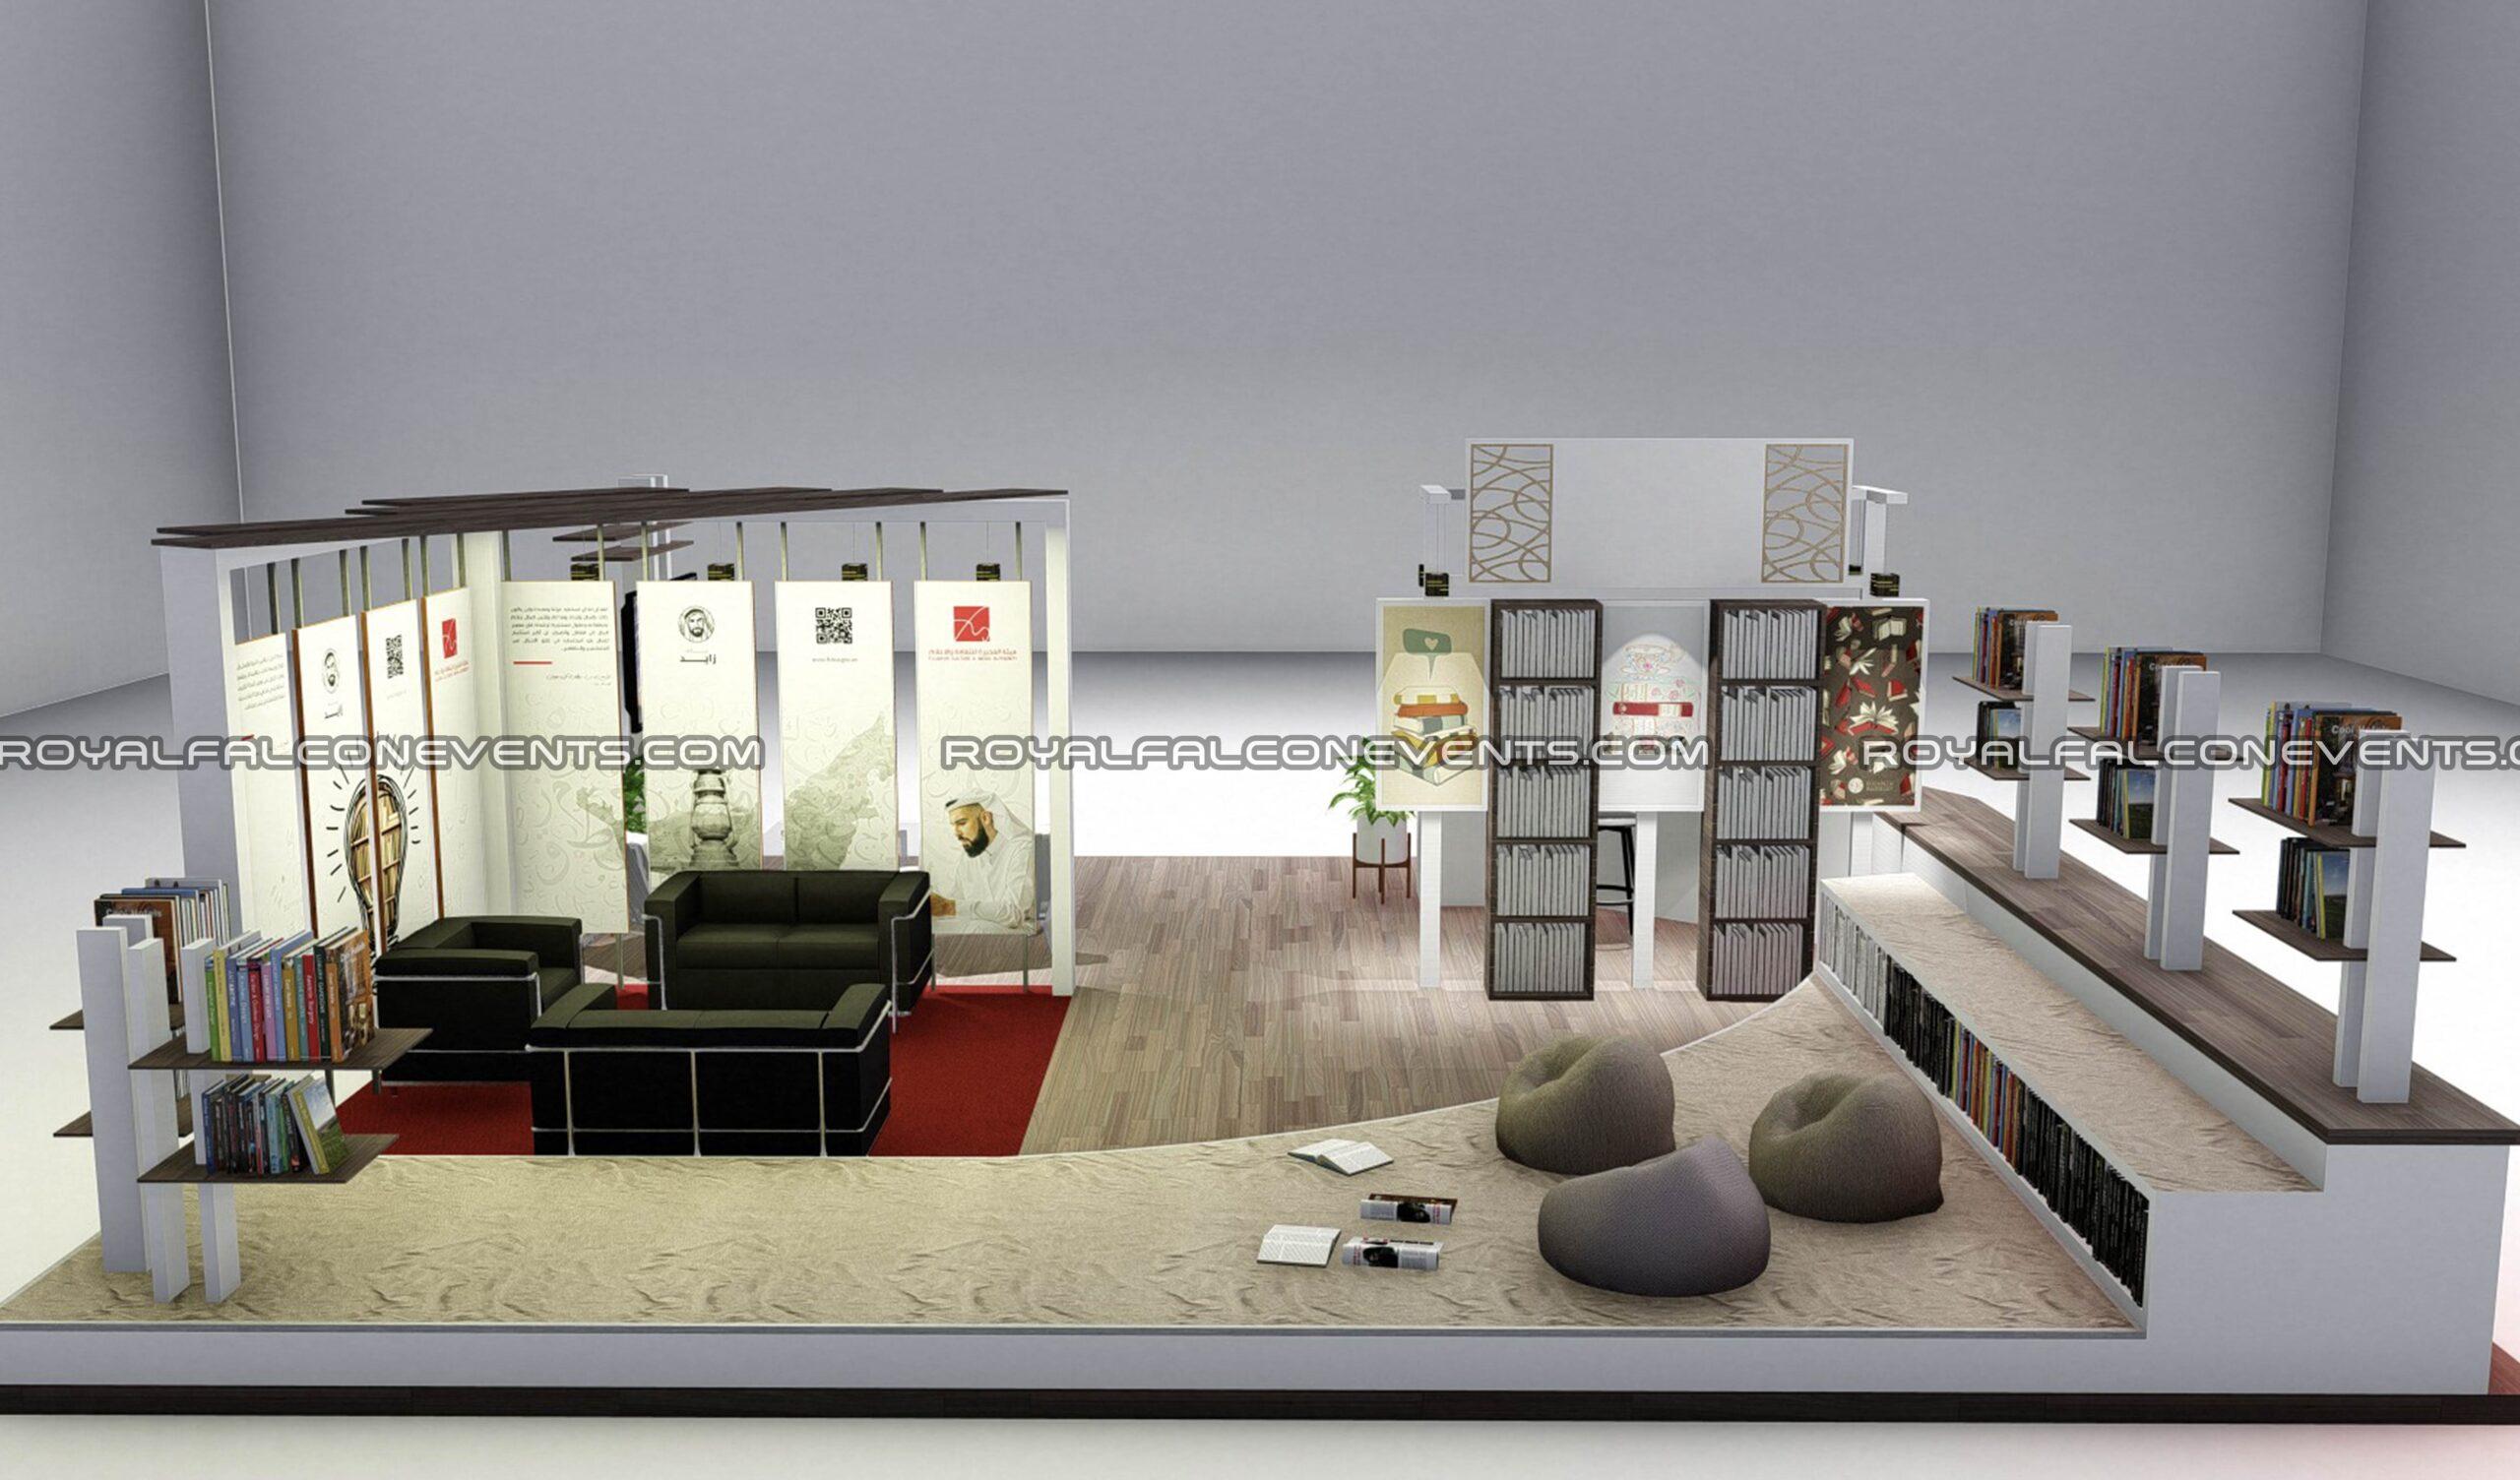 Exhibition Stand Makers In Dubai : Exhibition stand builders dubai u tgp